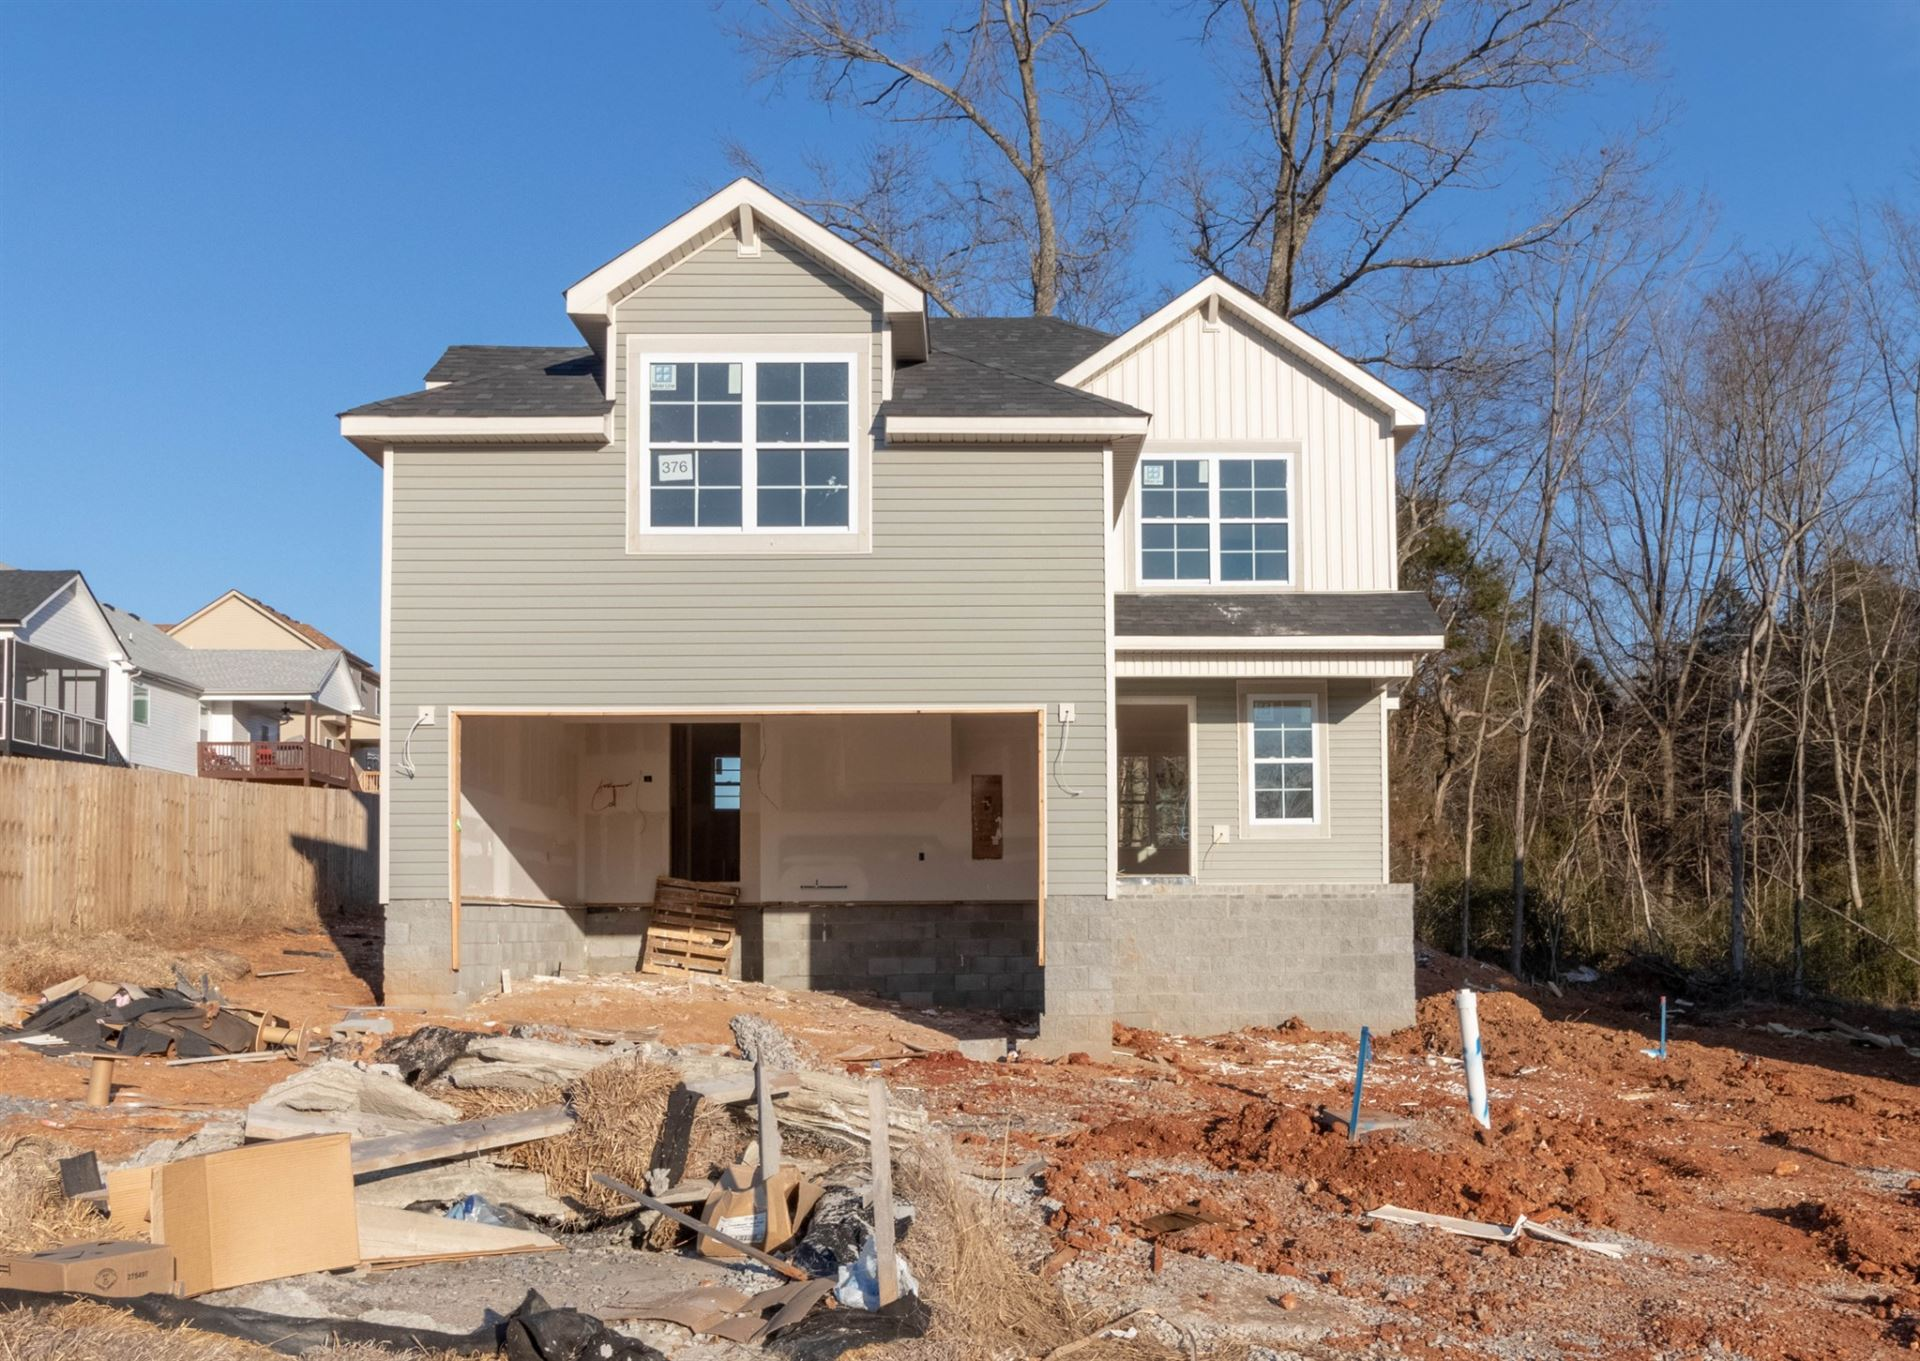 204 Bonnell Drive, Clarksville, TN 37040 - MLS#: 2206361